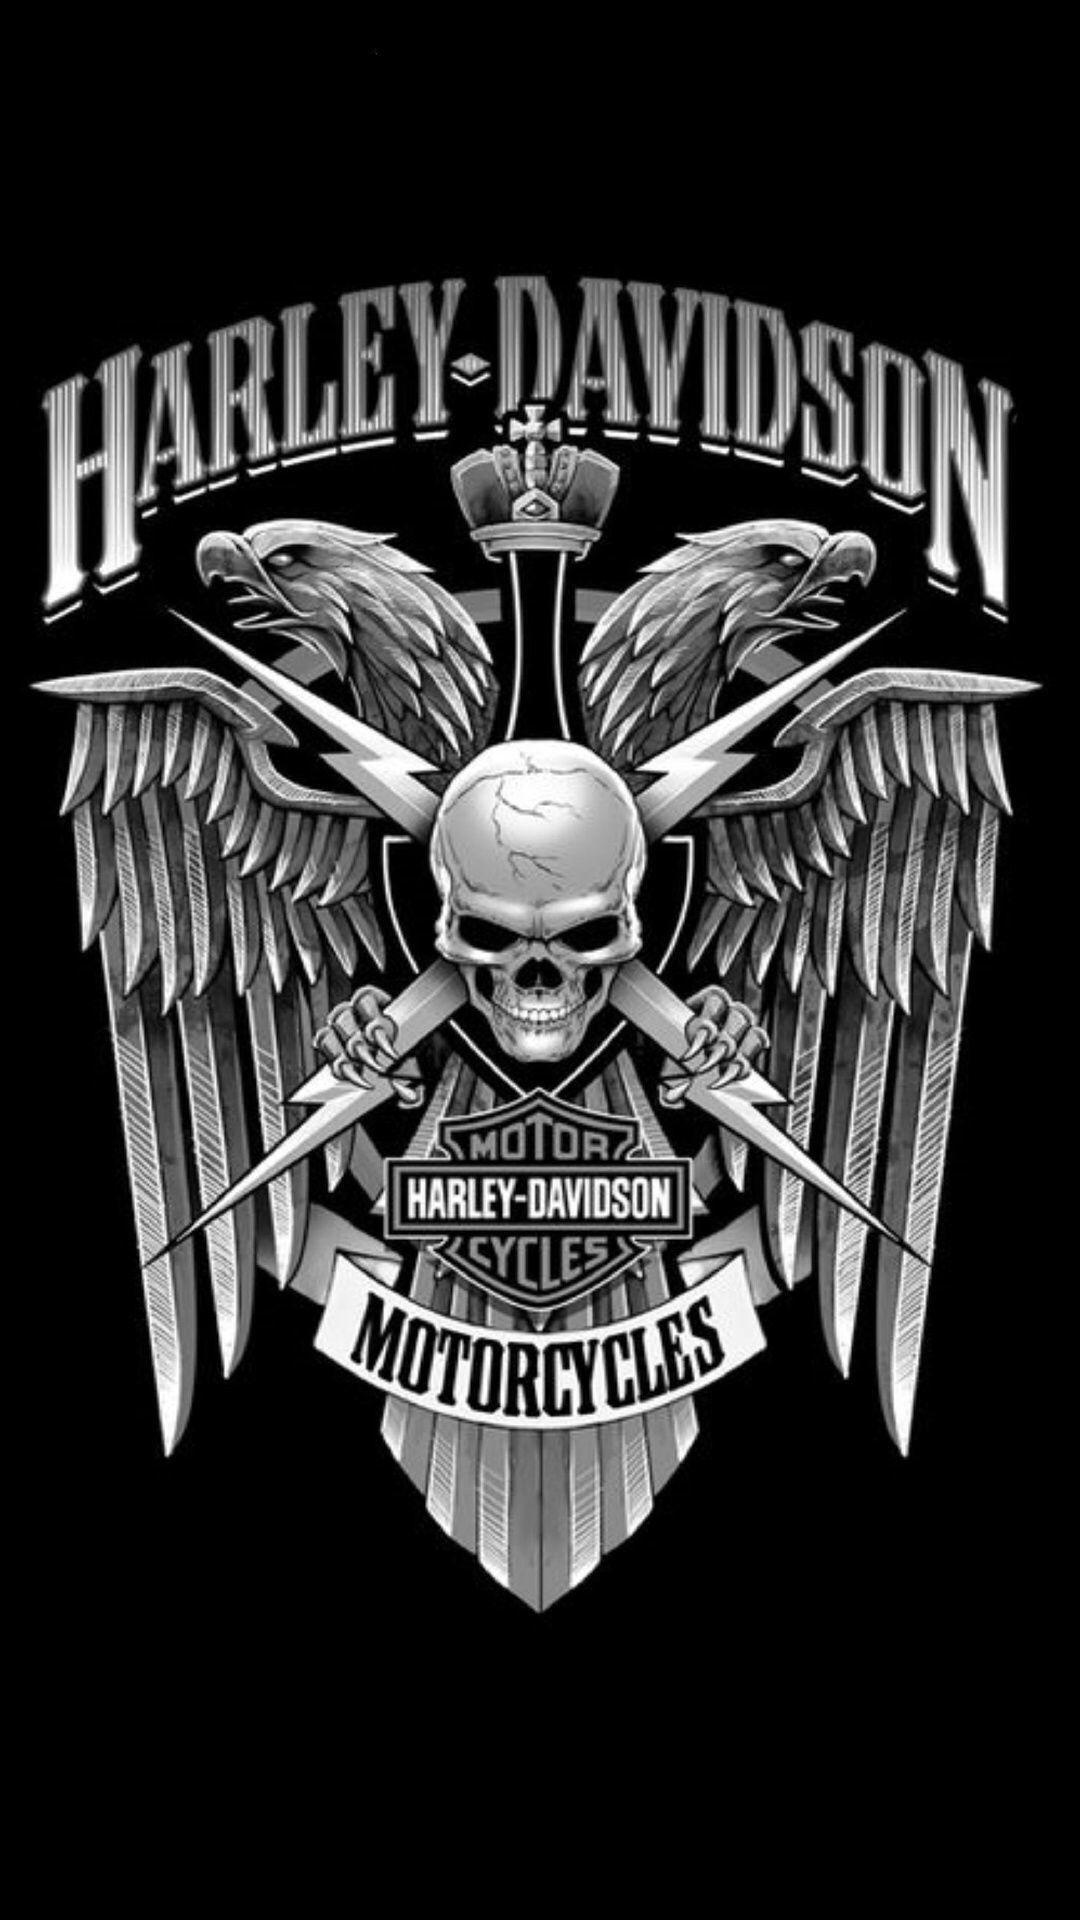 Awesome Harley Davidson Iphone Wallpaper Planos De Fundo Fundos